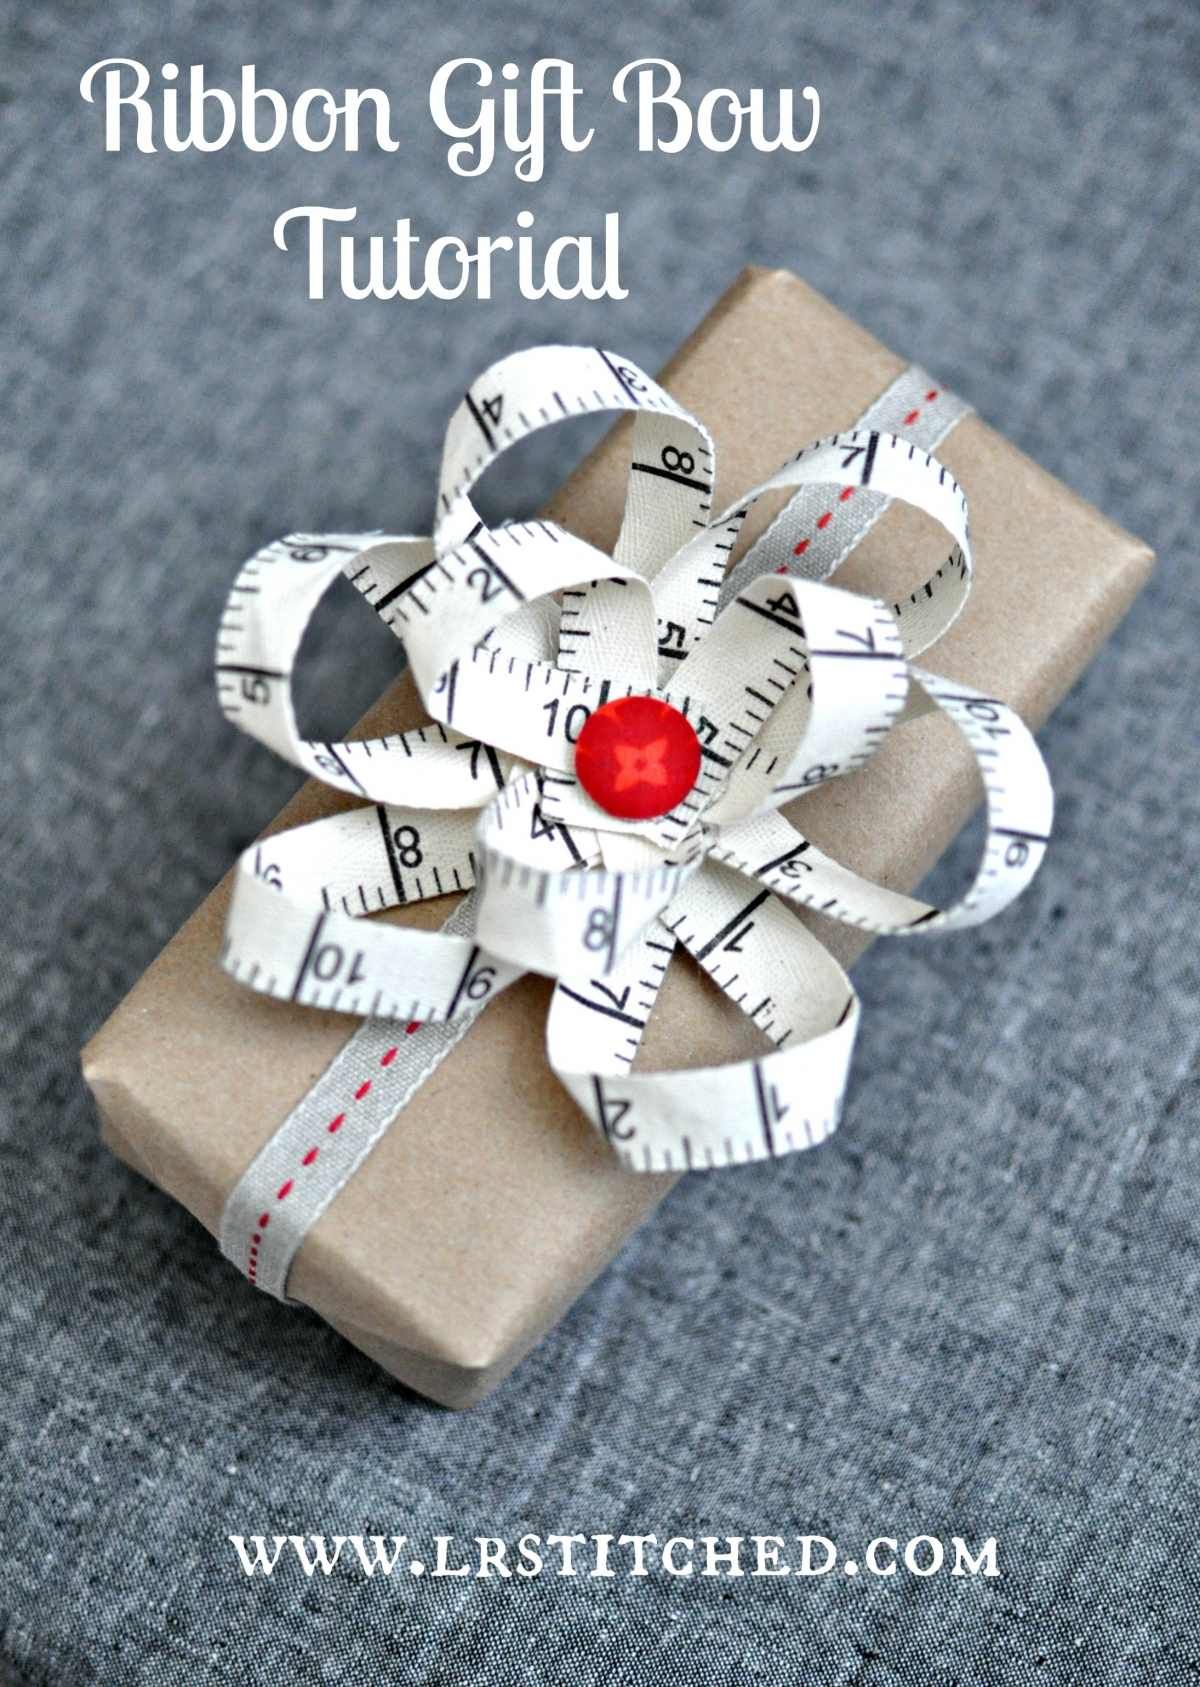 Tutorial Ribbon Gift Bow